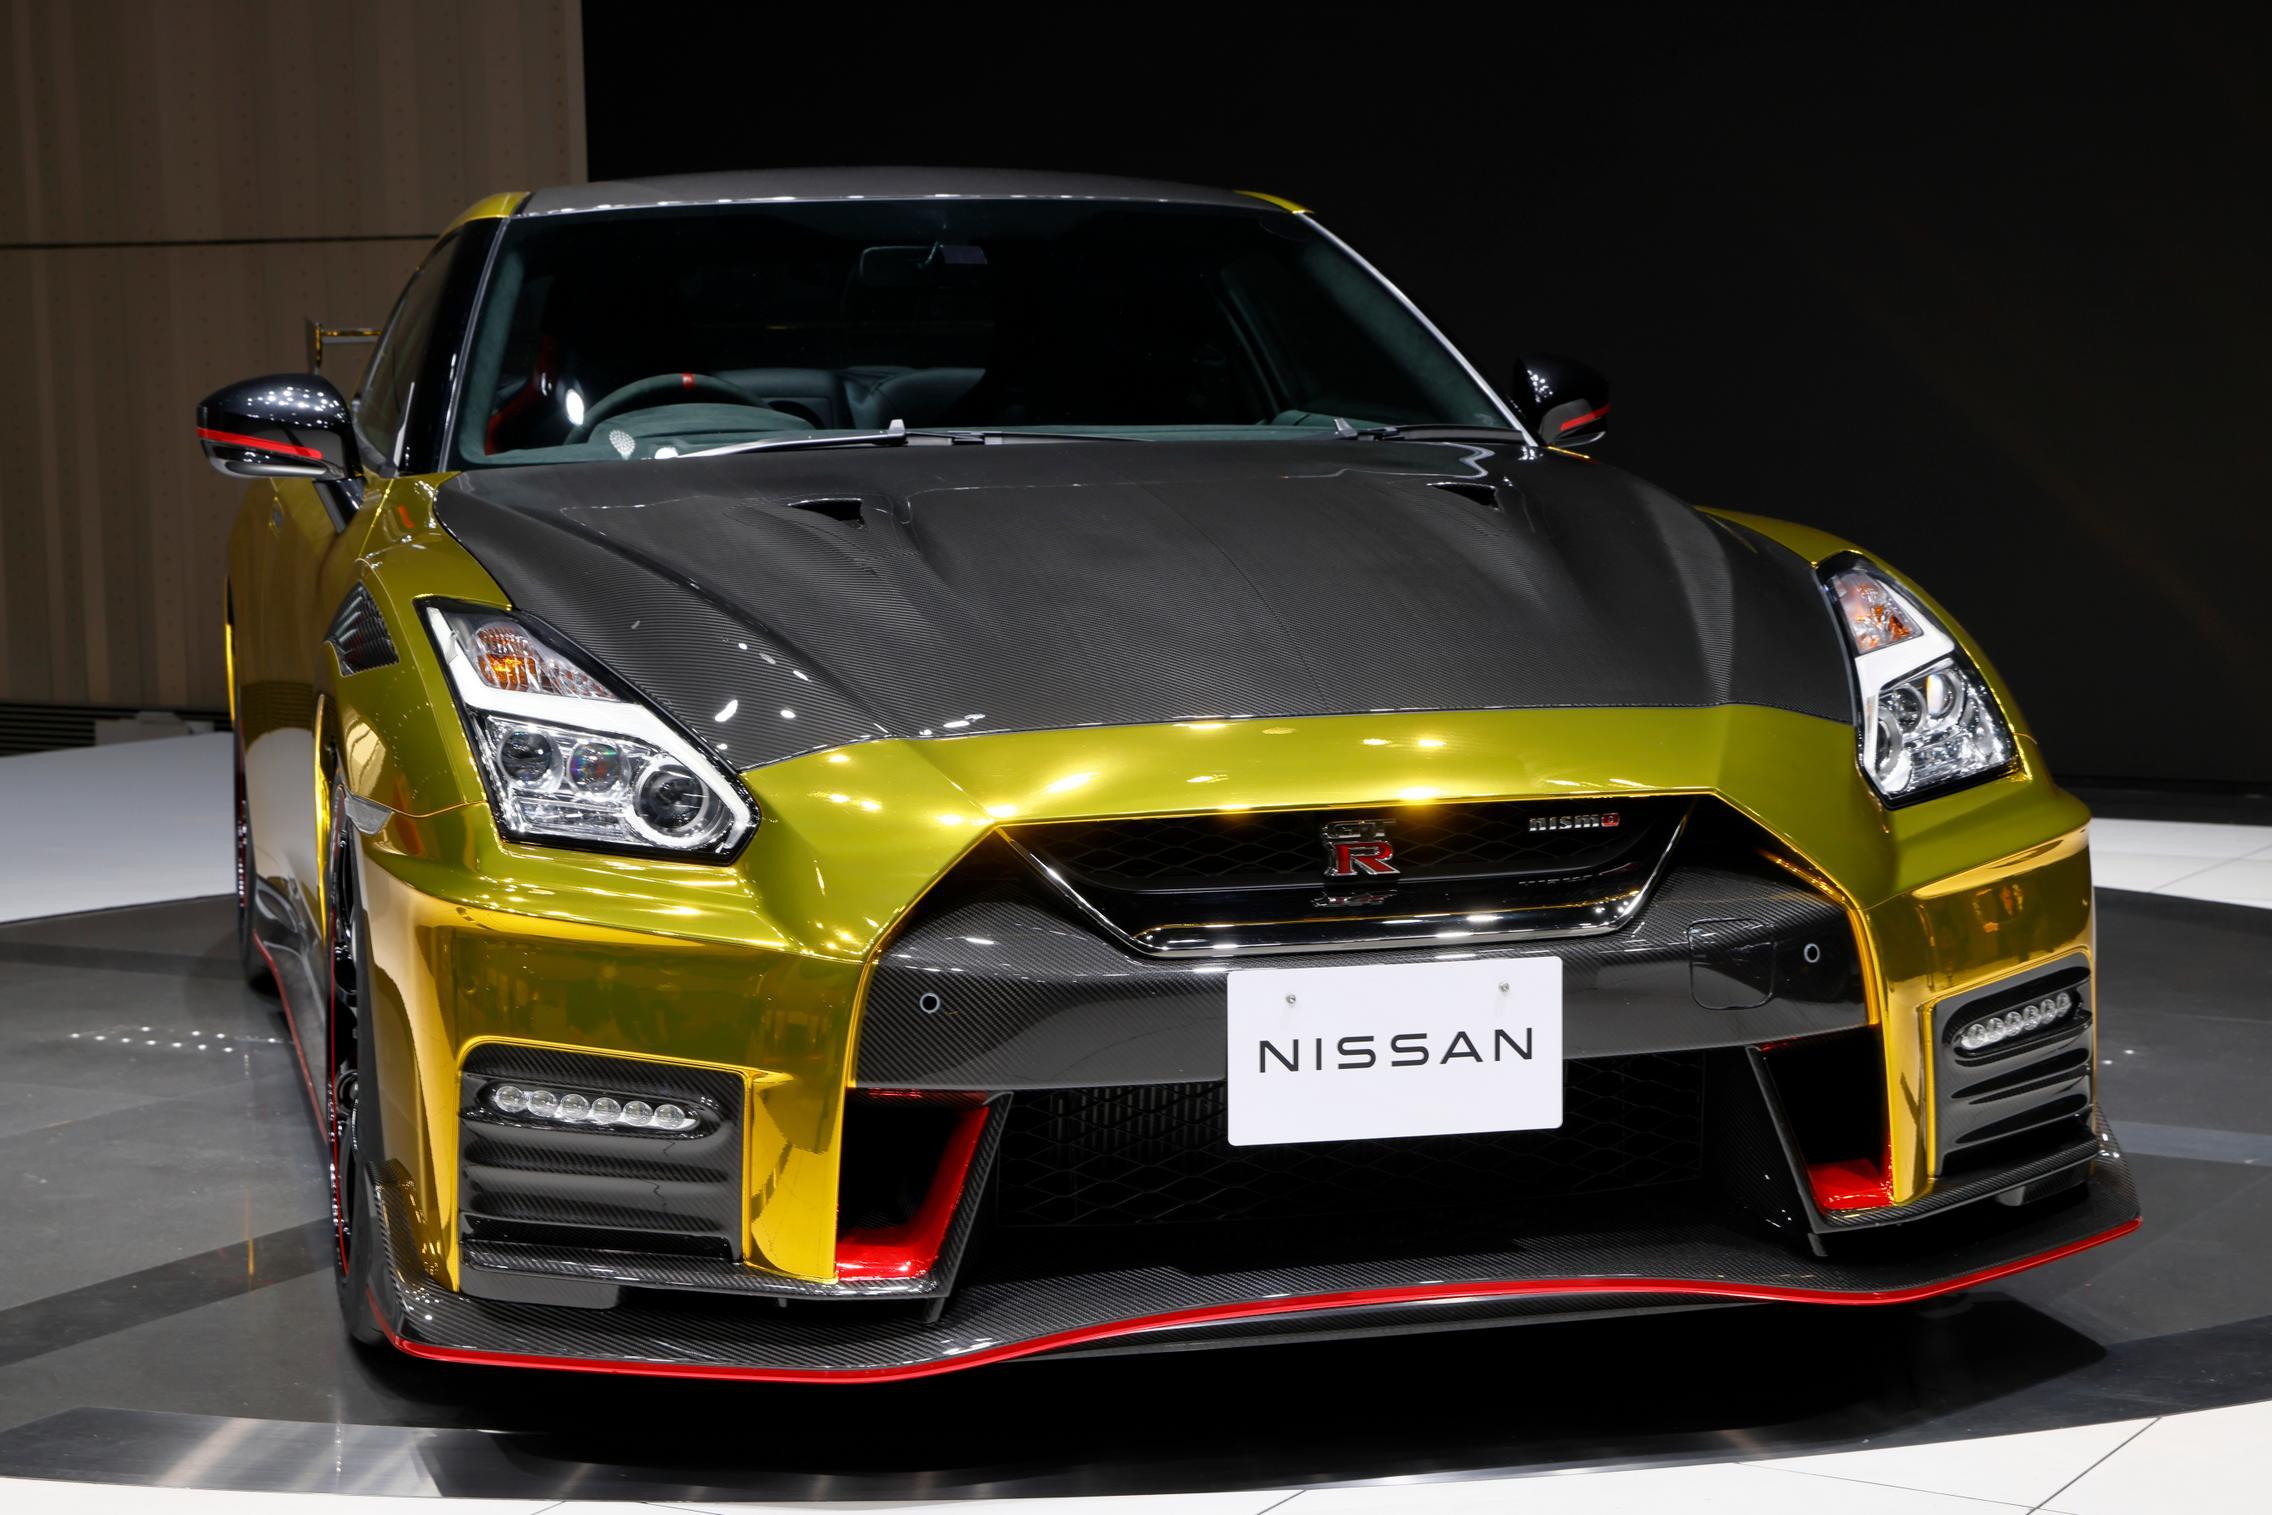 2022 Nissan GT-R Nismo gold